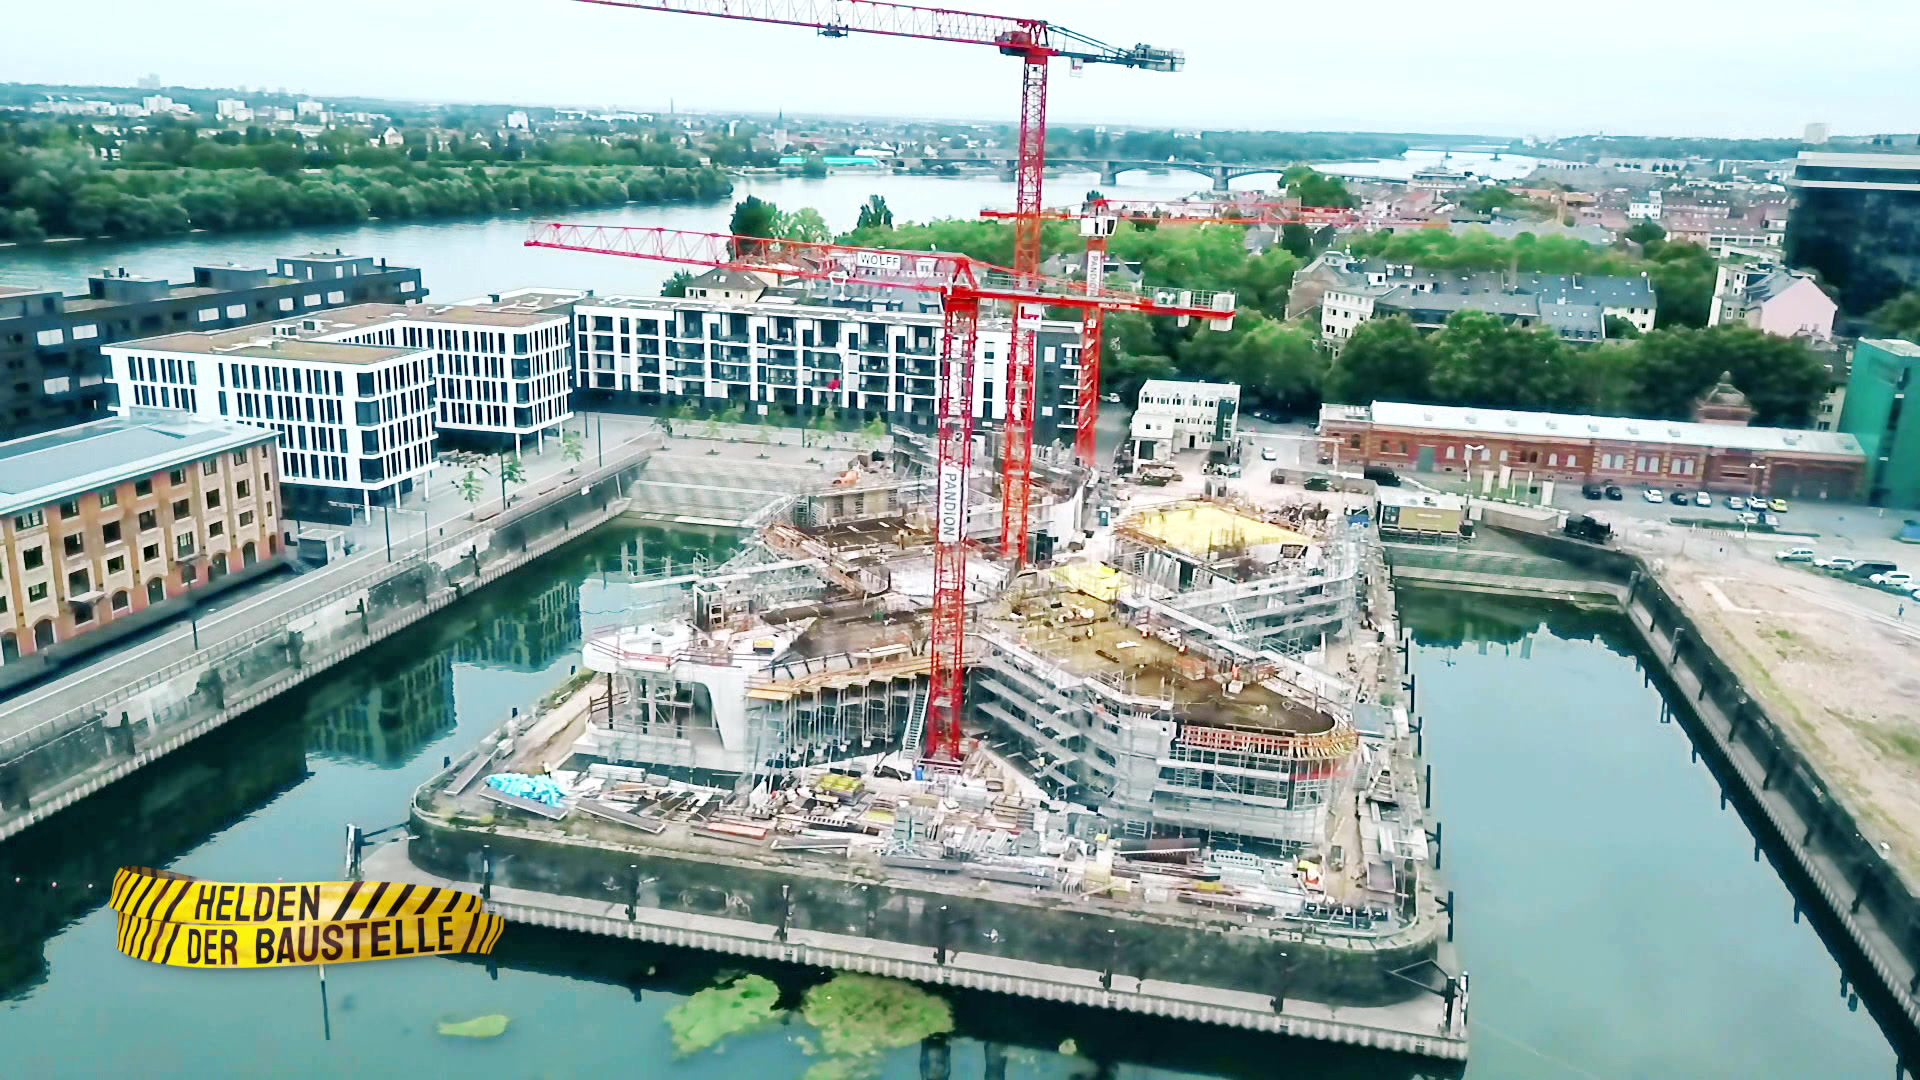 Helden Der Baustelle Dmax